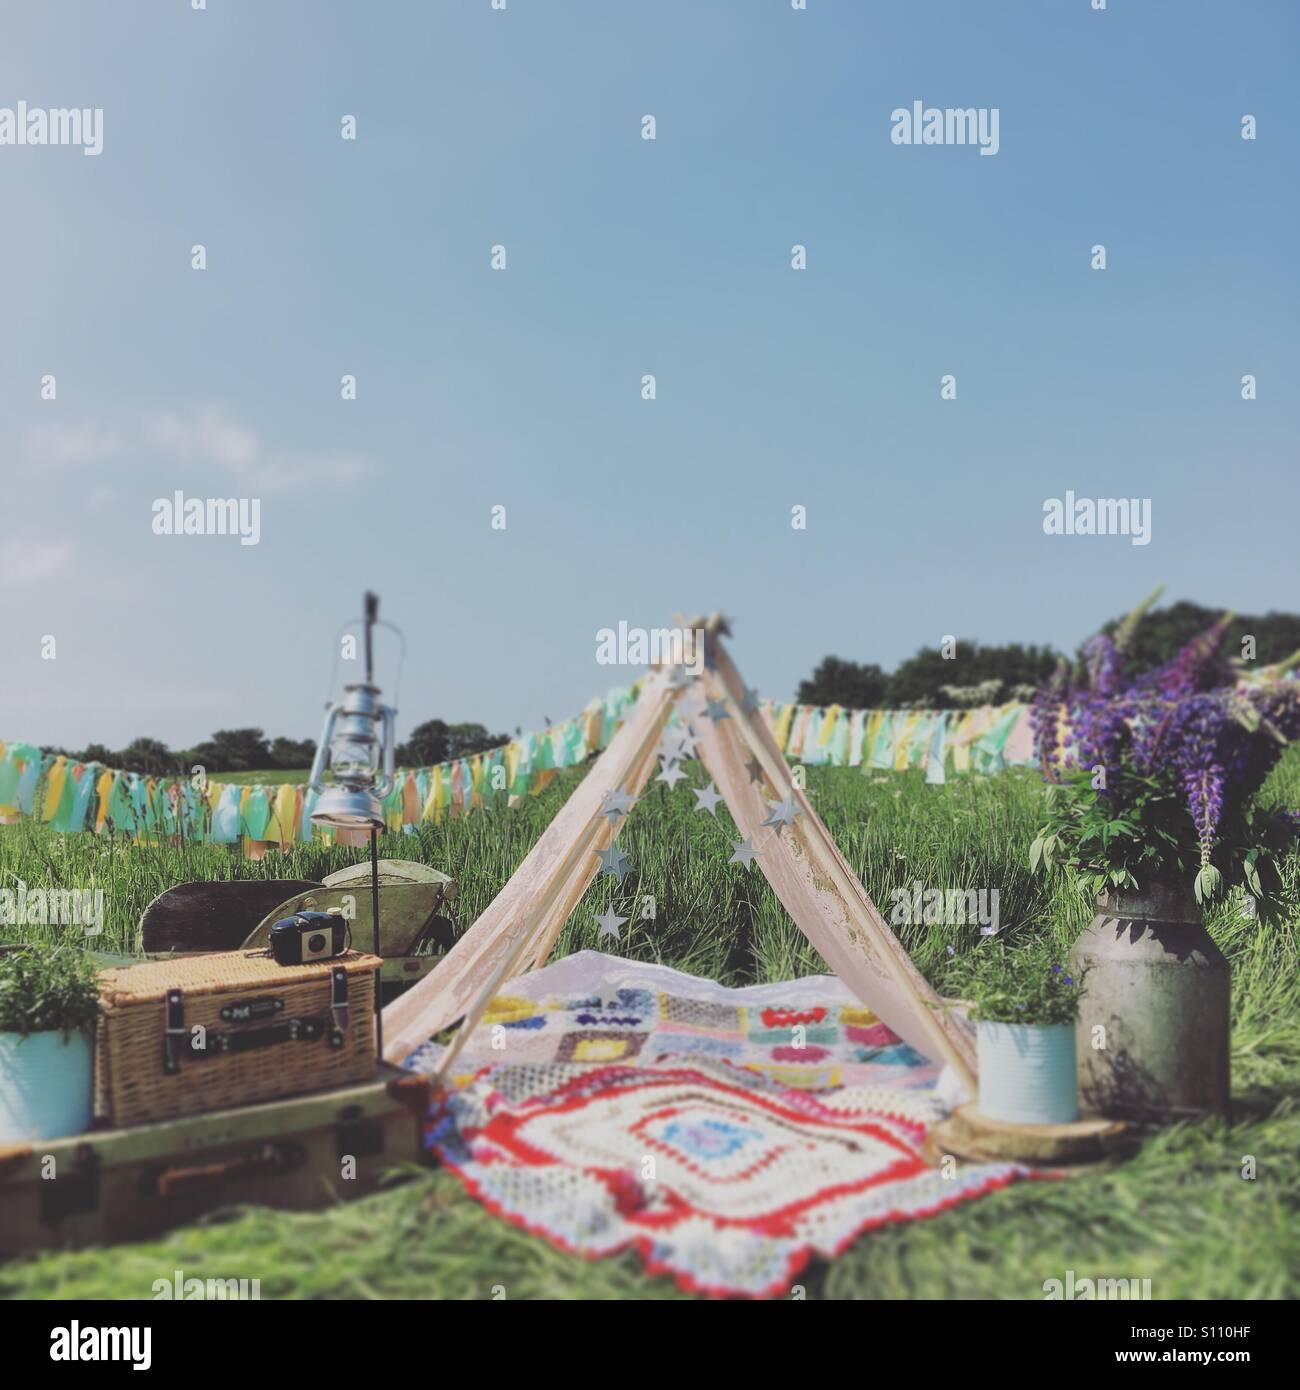 Sleeping under the stars tonight - Stock Image